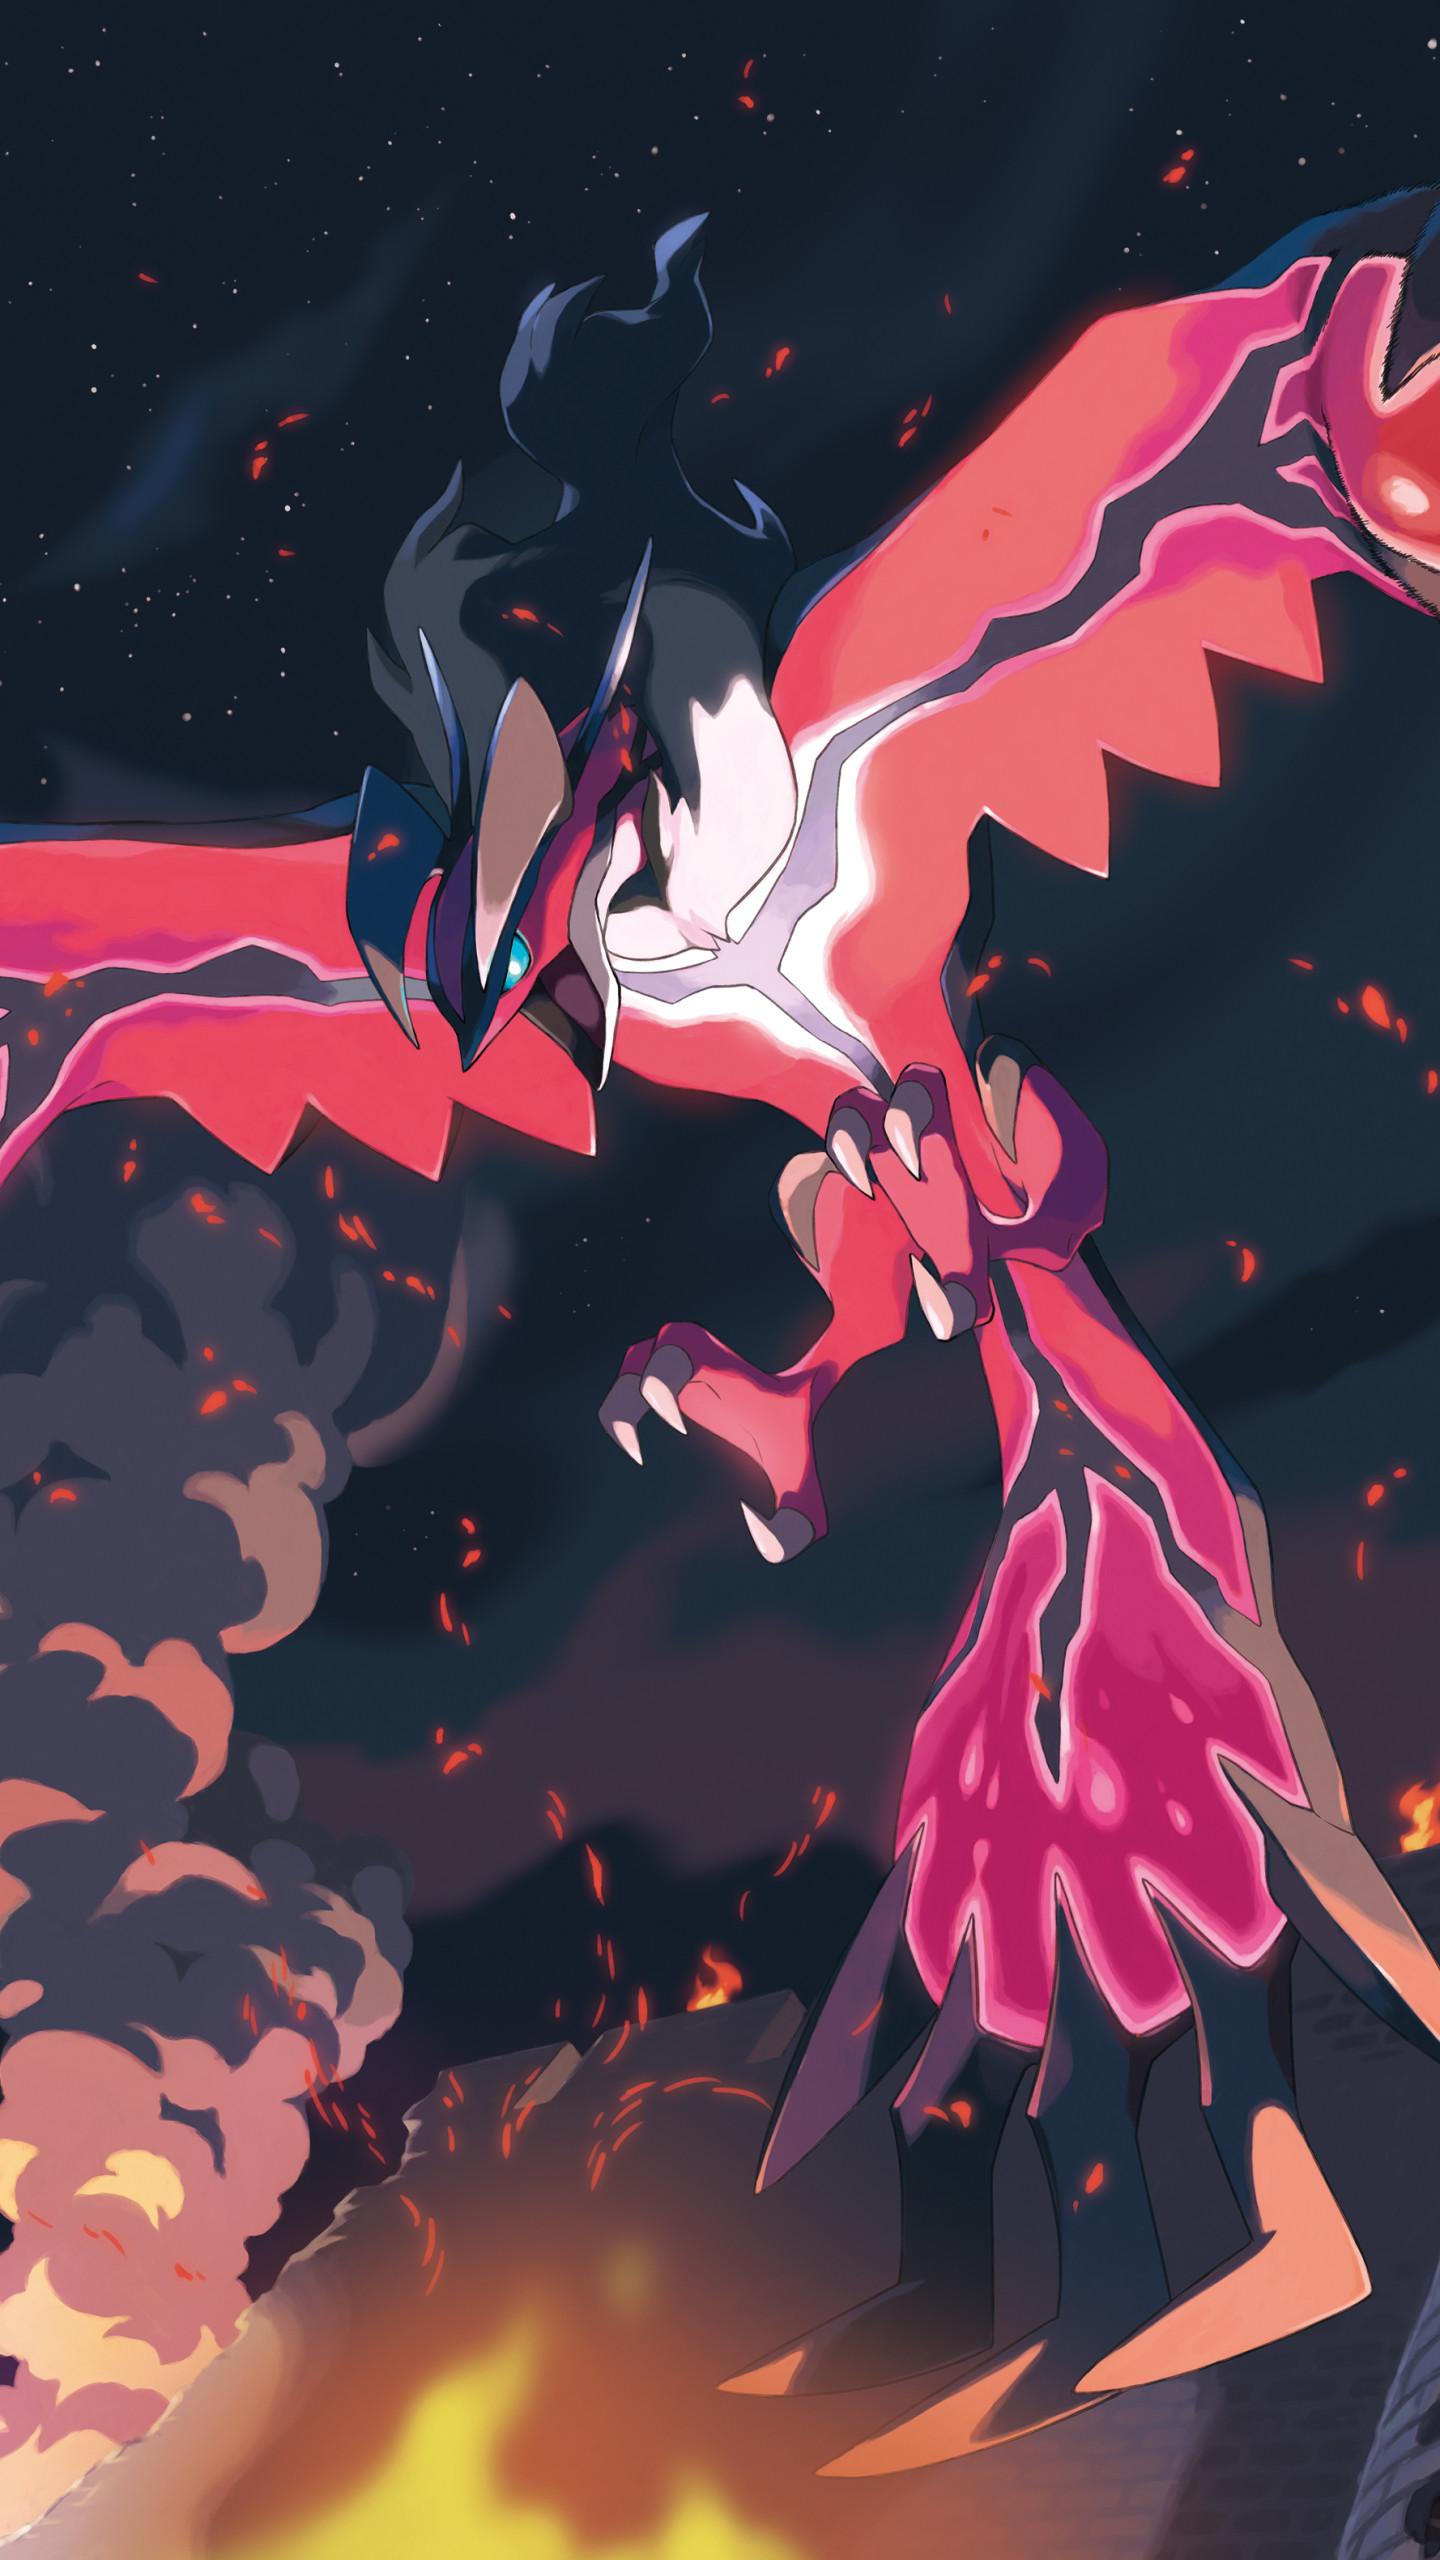 Video Game Pokemon Pokémon Yveltal Mobile Wallpaper